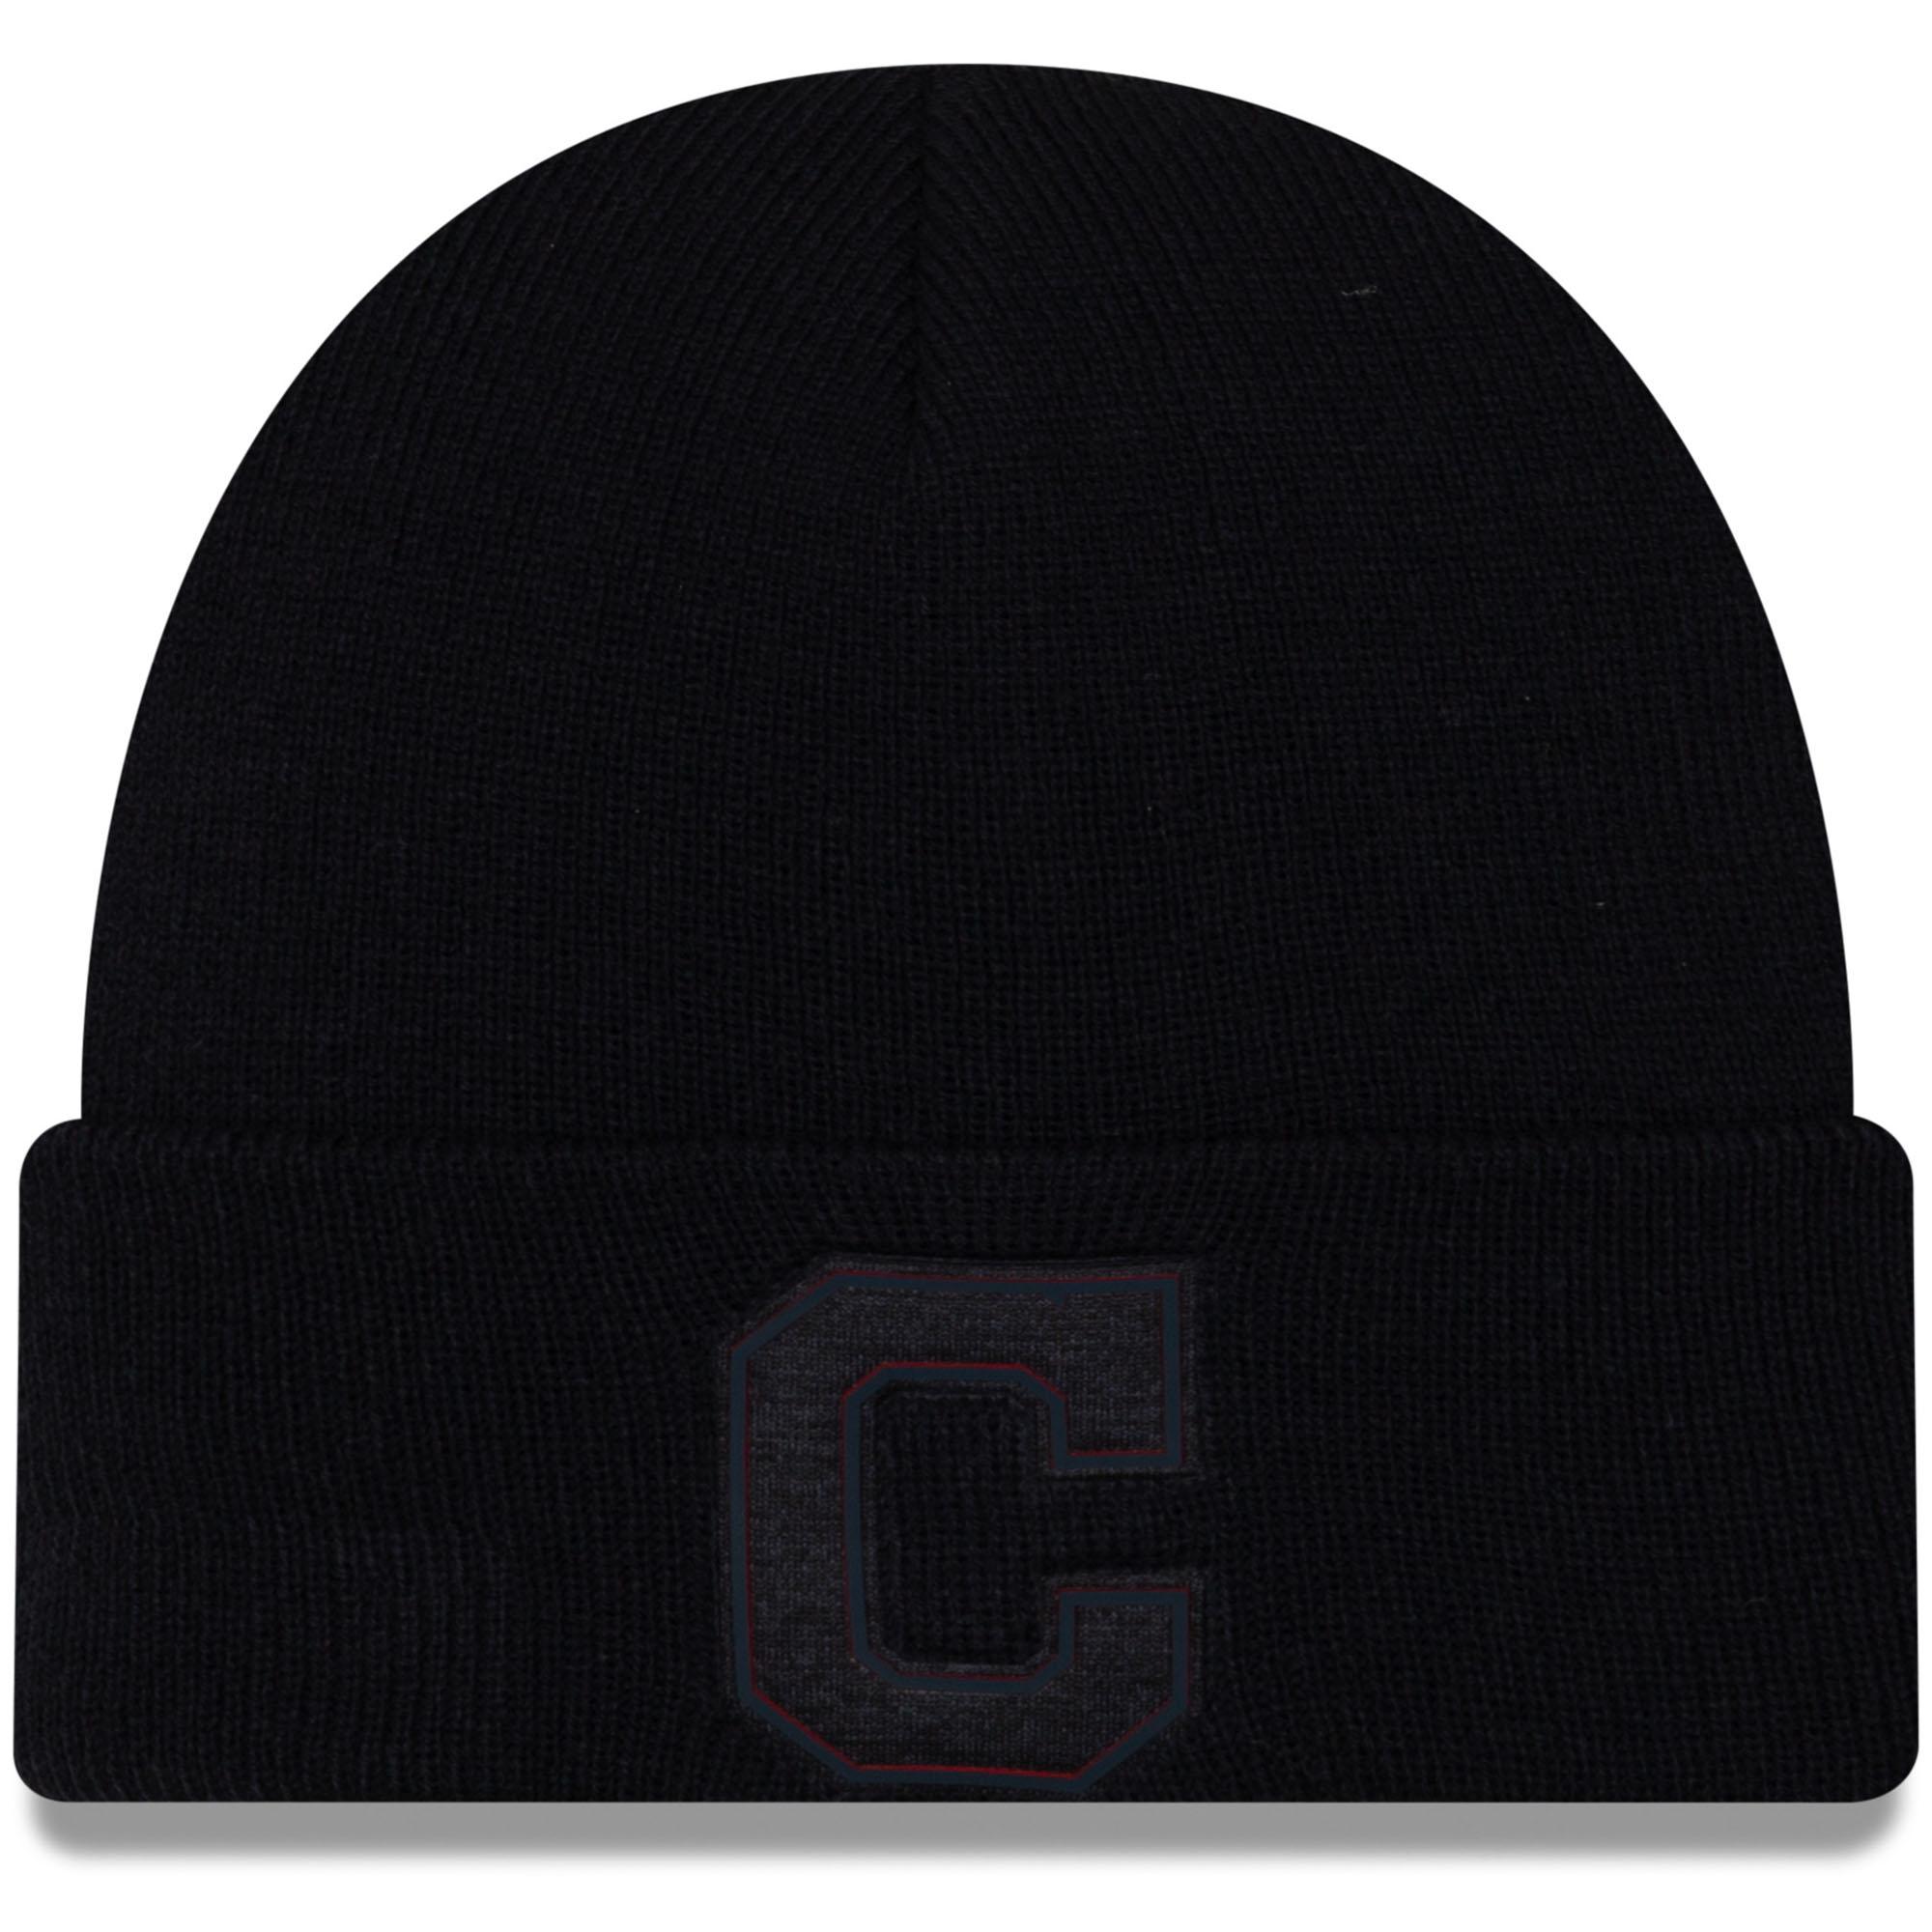 Cleveland Indians New Era Vivid Cuffed Knit Hat - Navy